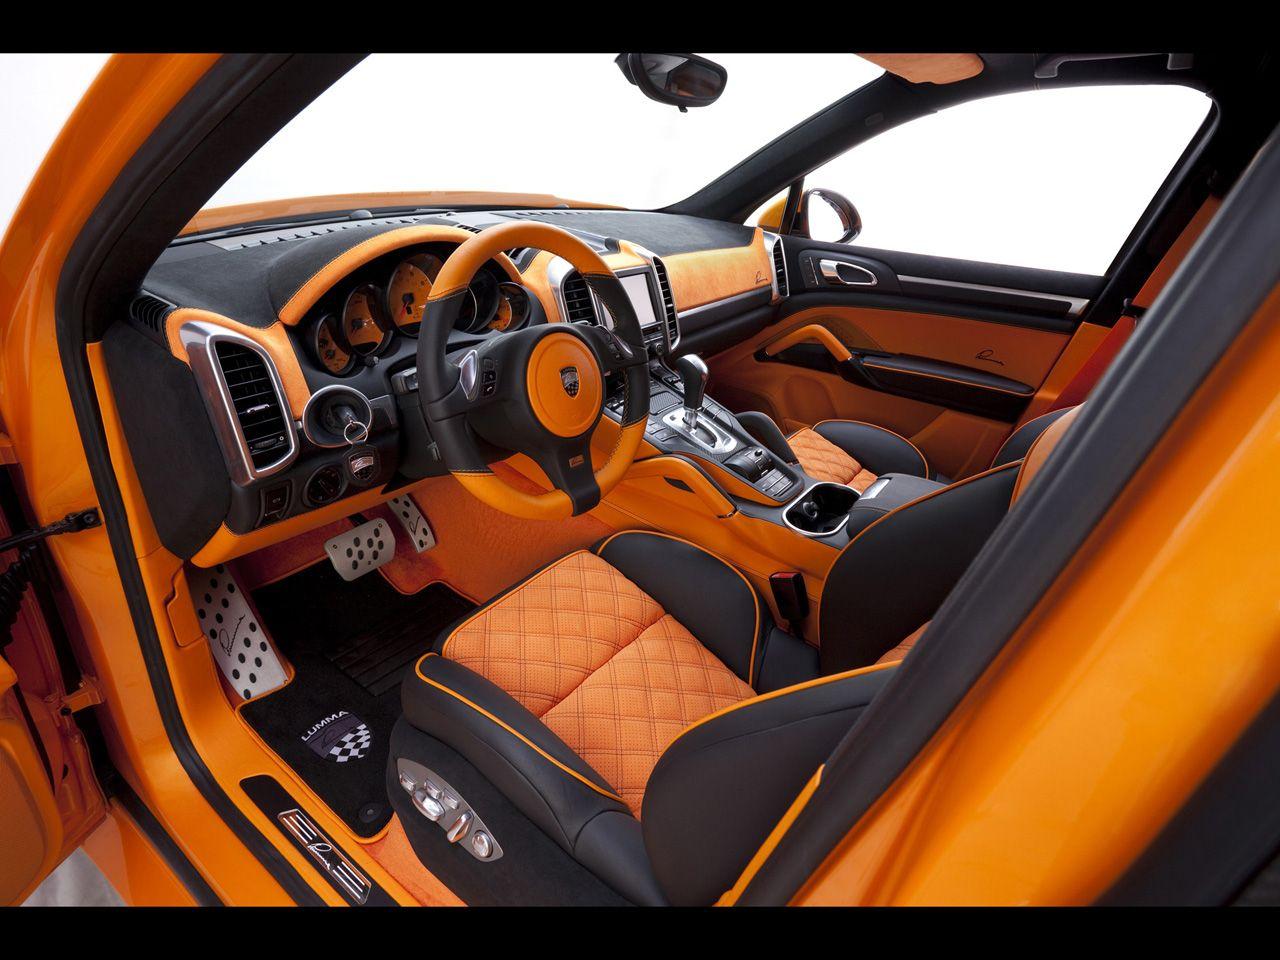 2012 Lumma Design Porsche Cayenne Custom Car Interior Car Interior Custom Cars